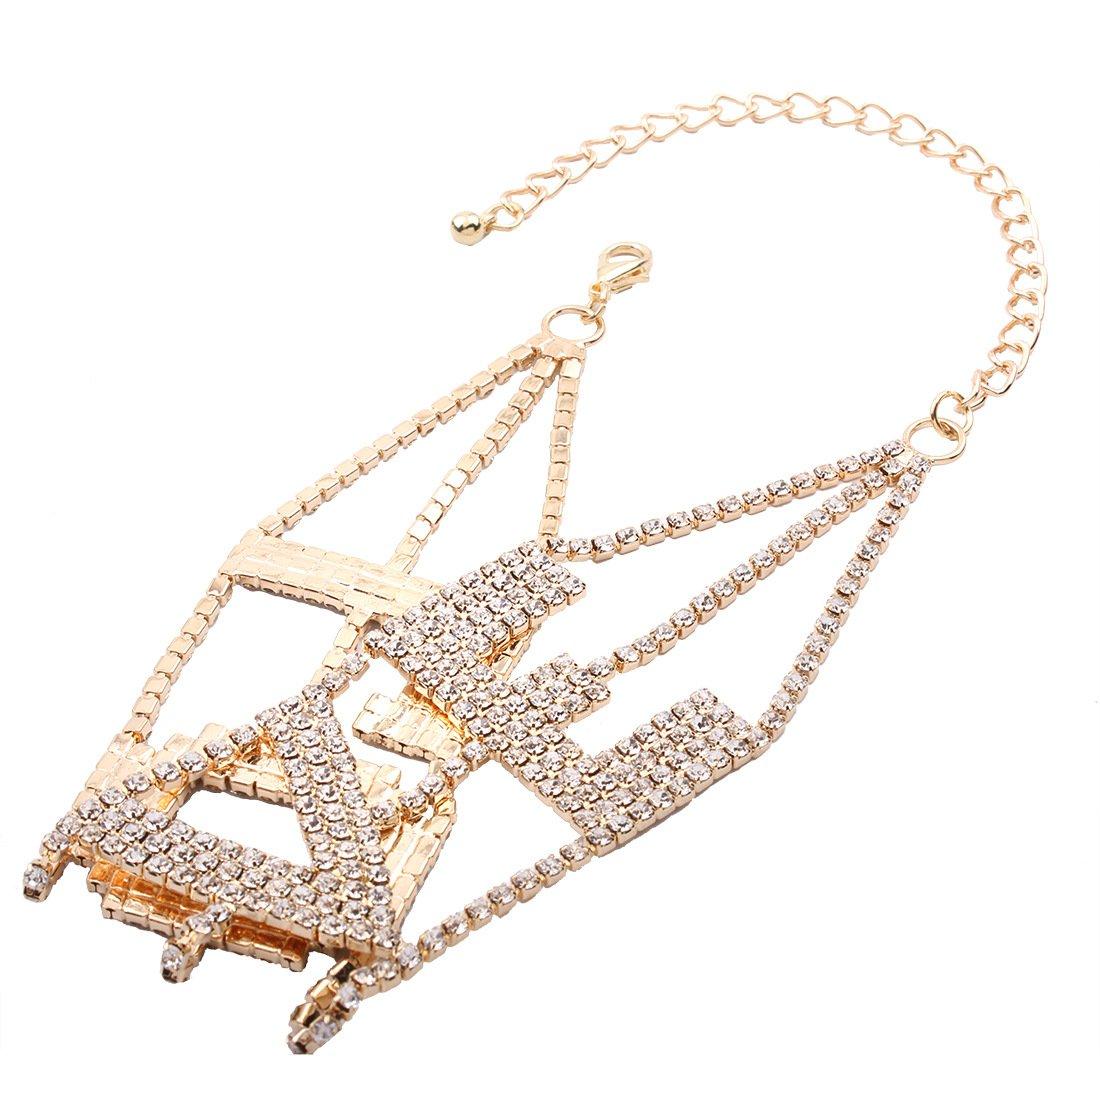 MengPa Rhinestone Choker Necklace for Women Fashion Letter Love Collar Wedding Jewelry Gold by MengPa (Image #4)